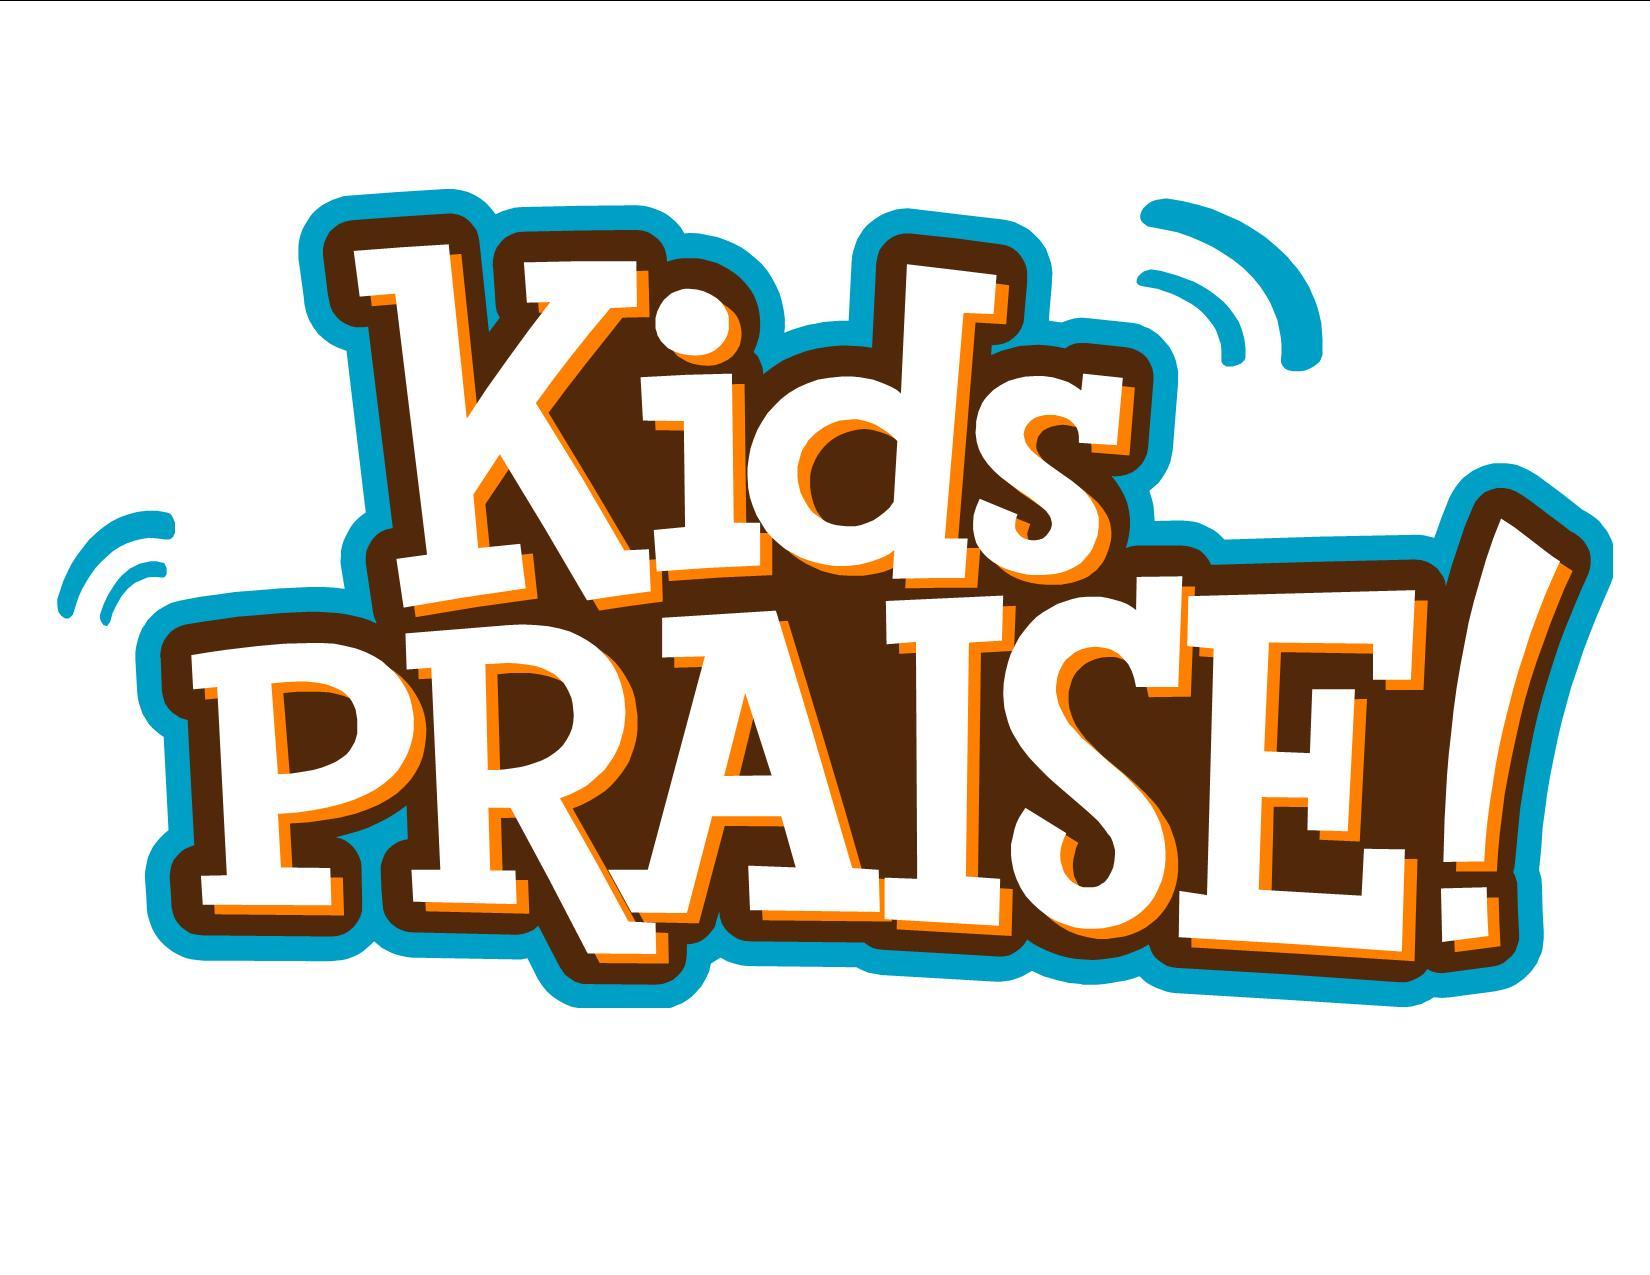 Kids praise logo